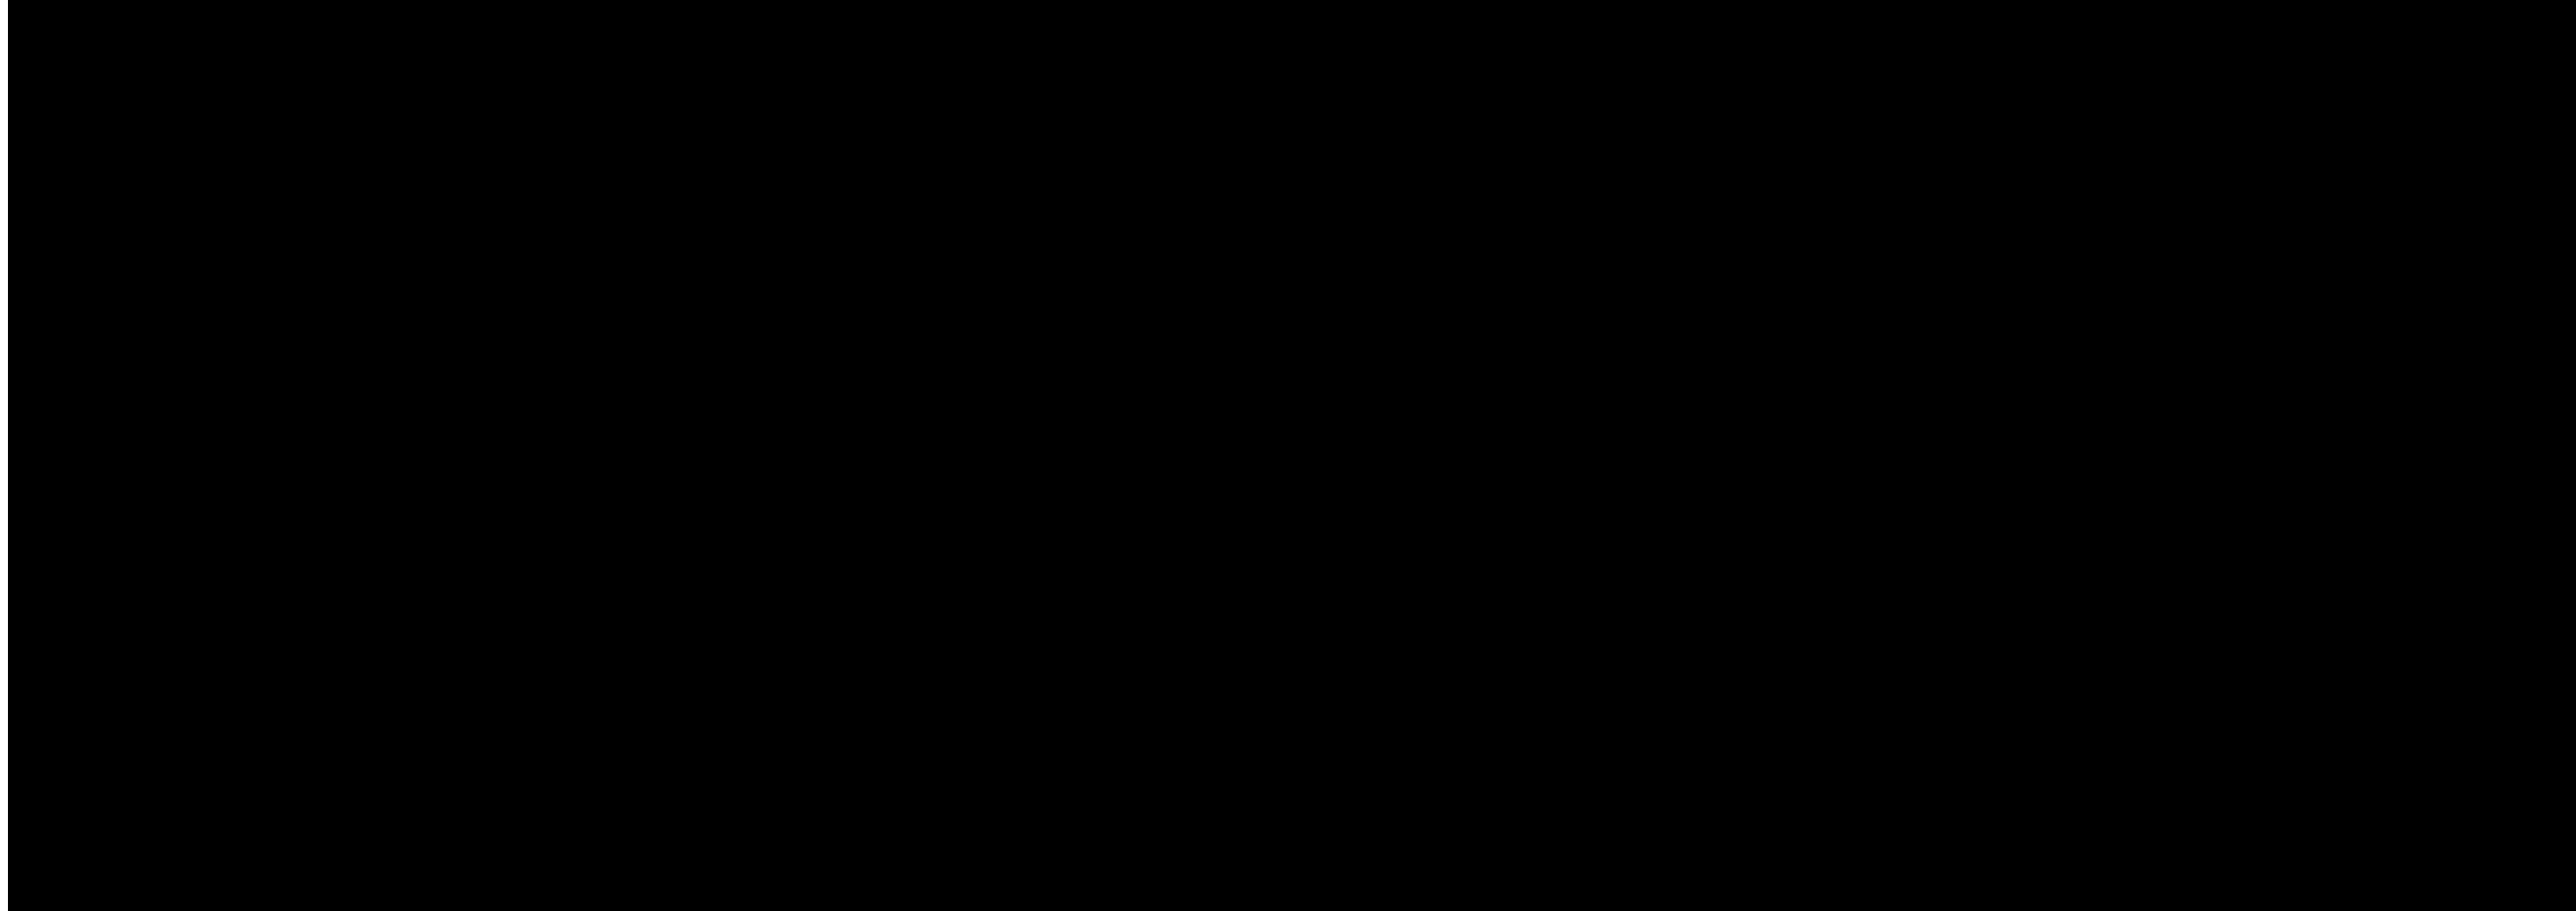 krazy larry